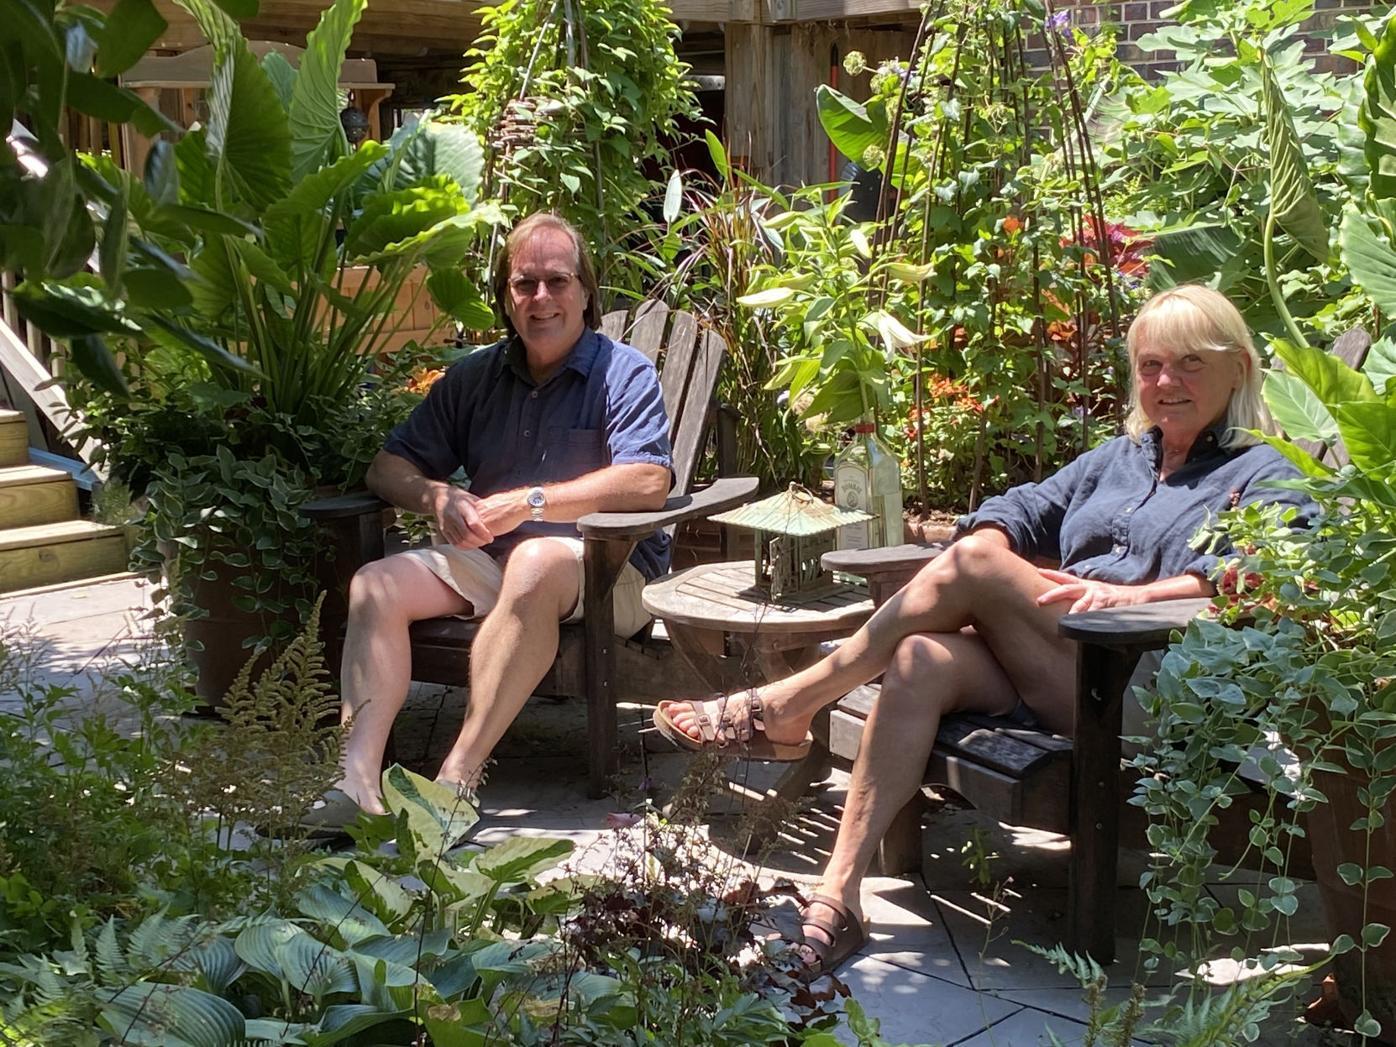 David Leider and Jane Gamble